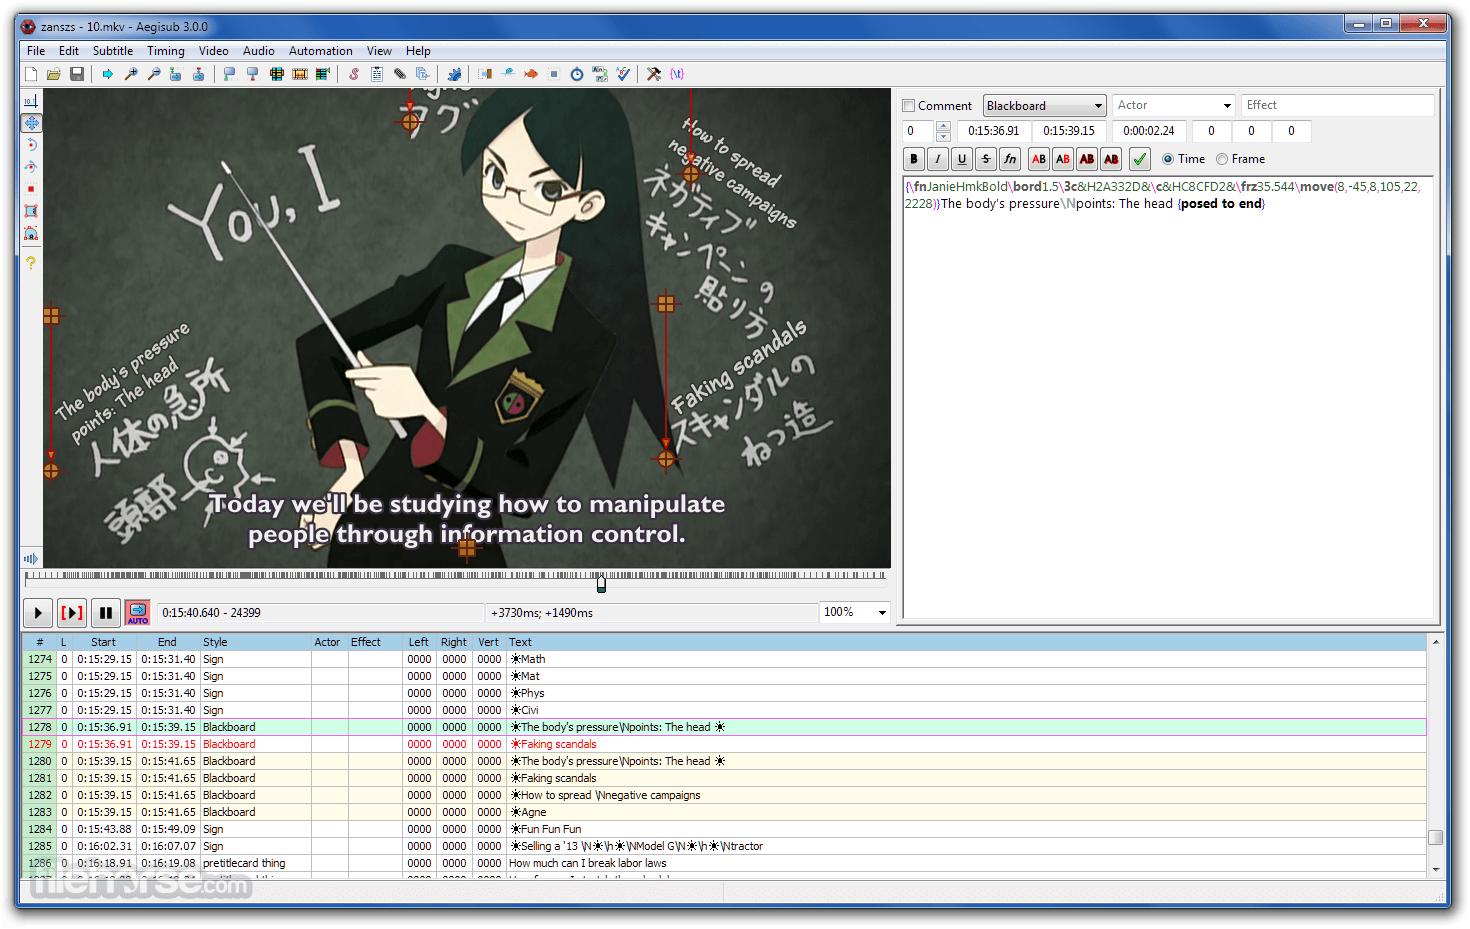 Aegisub 3.2.2 (64-bit) Screenshot 1